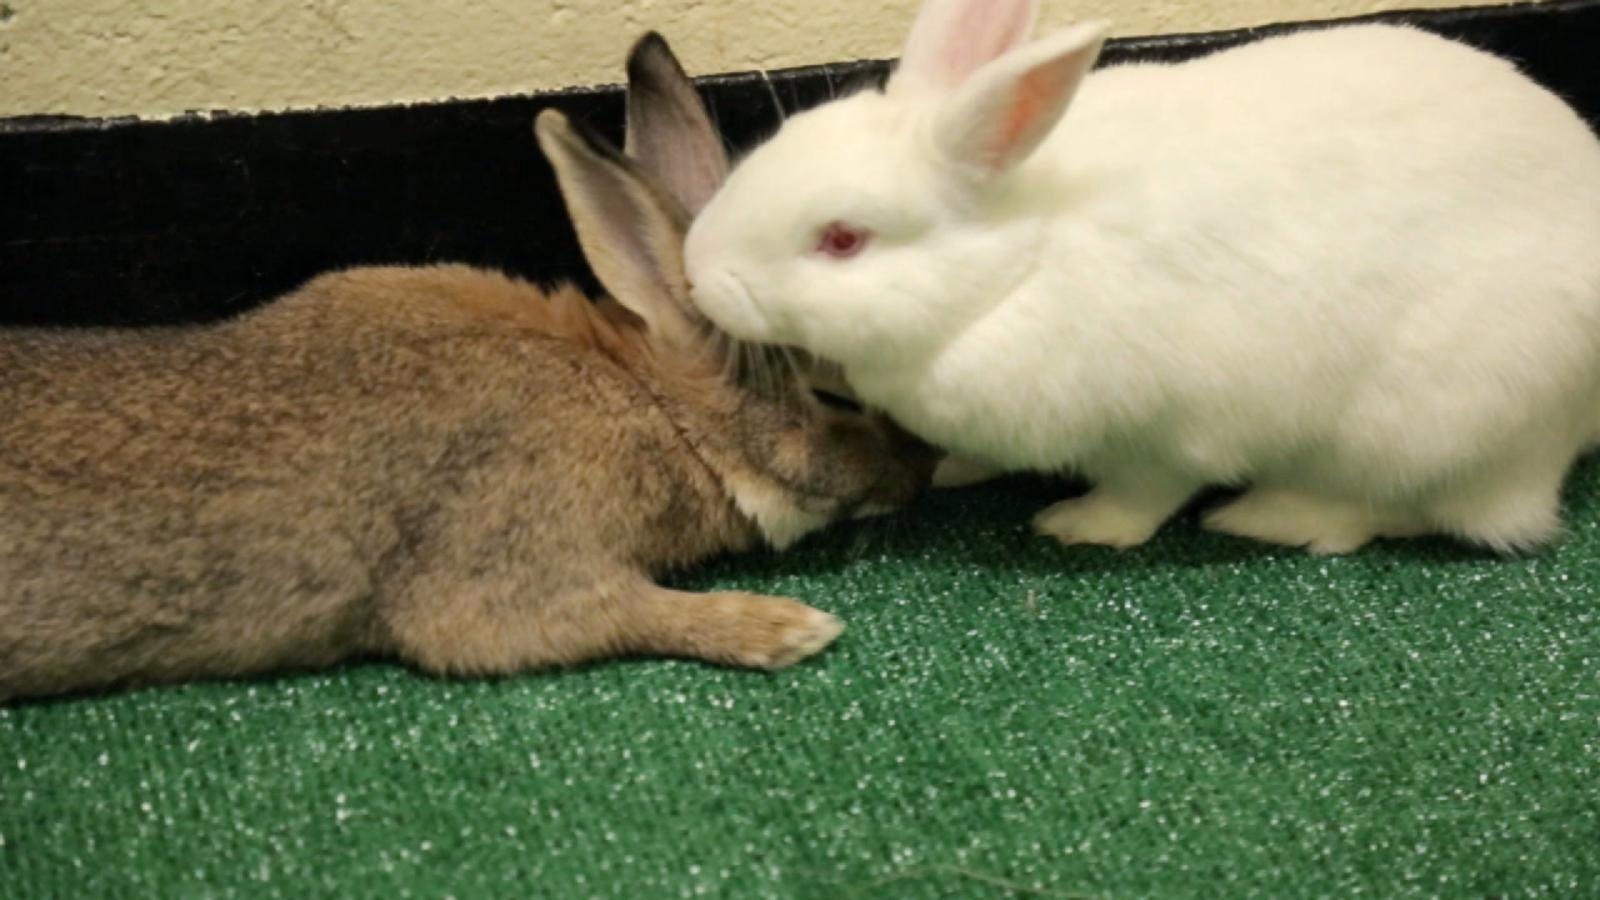 Rabbit speed dating